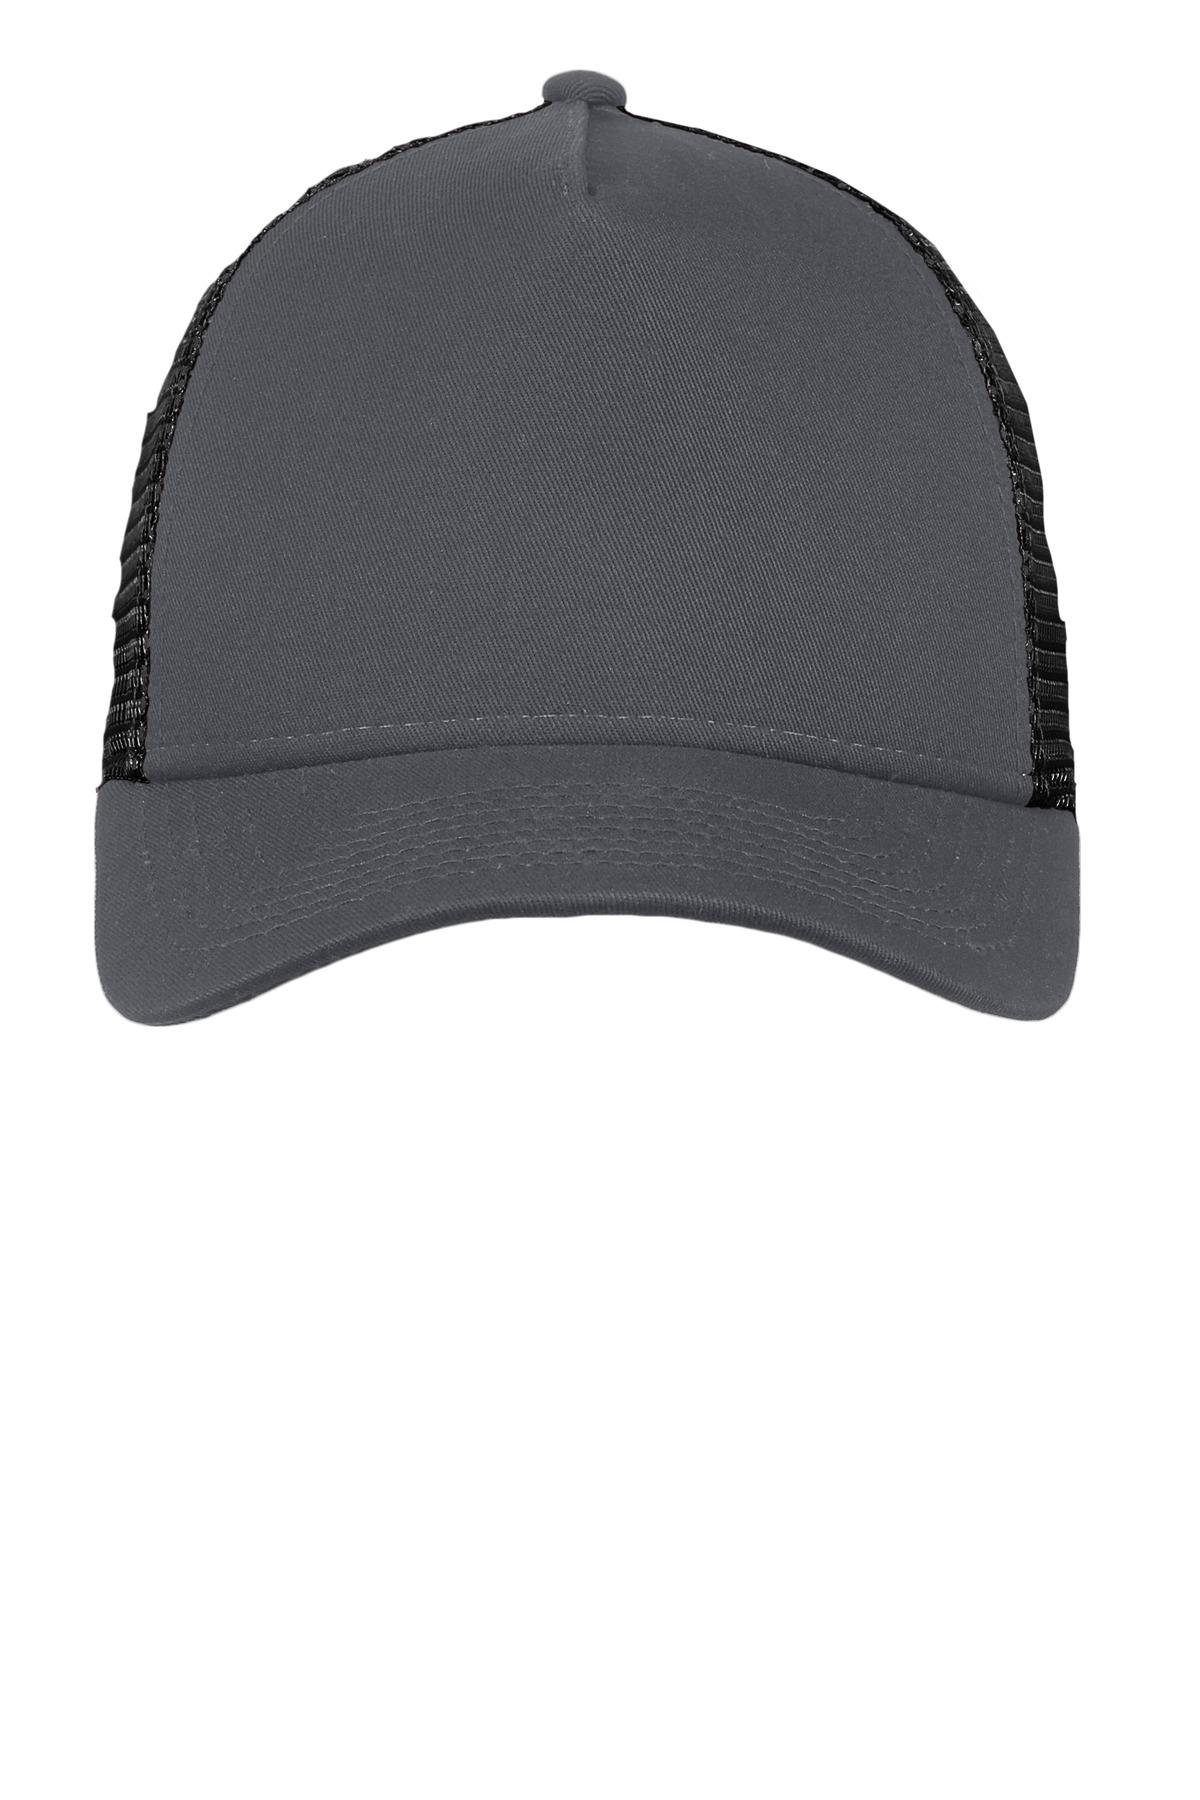 eeed22e2f11 New Era® Snapback Trucker Cap